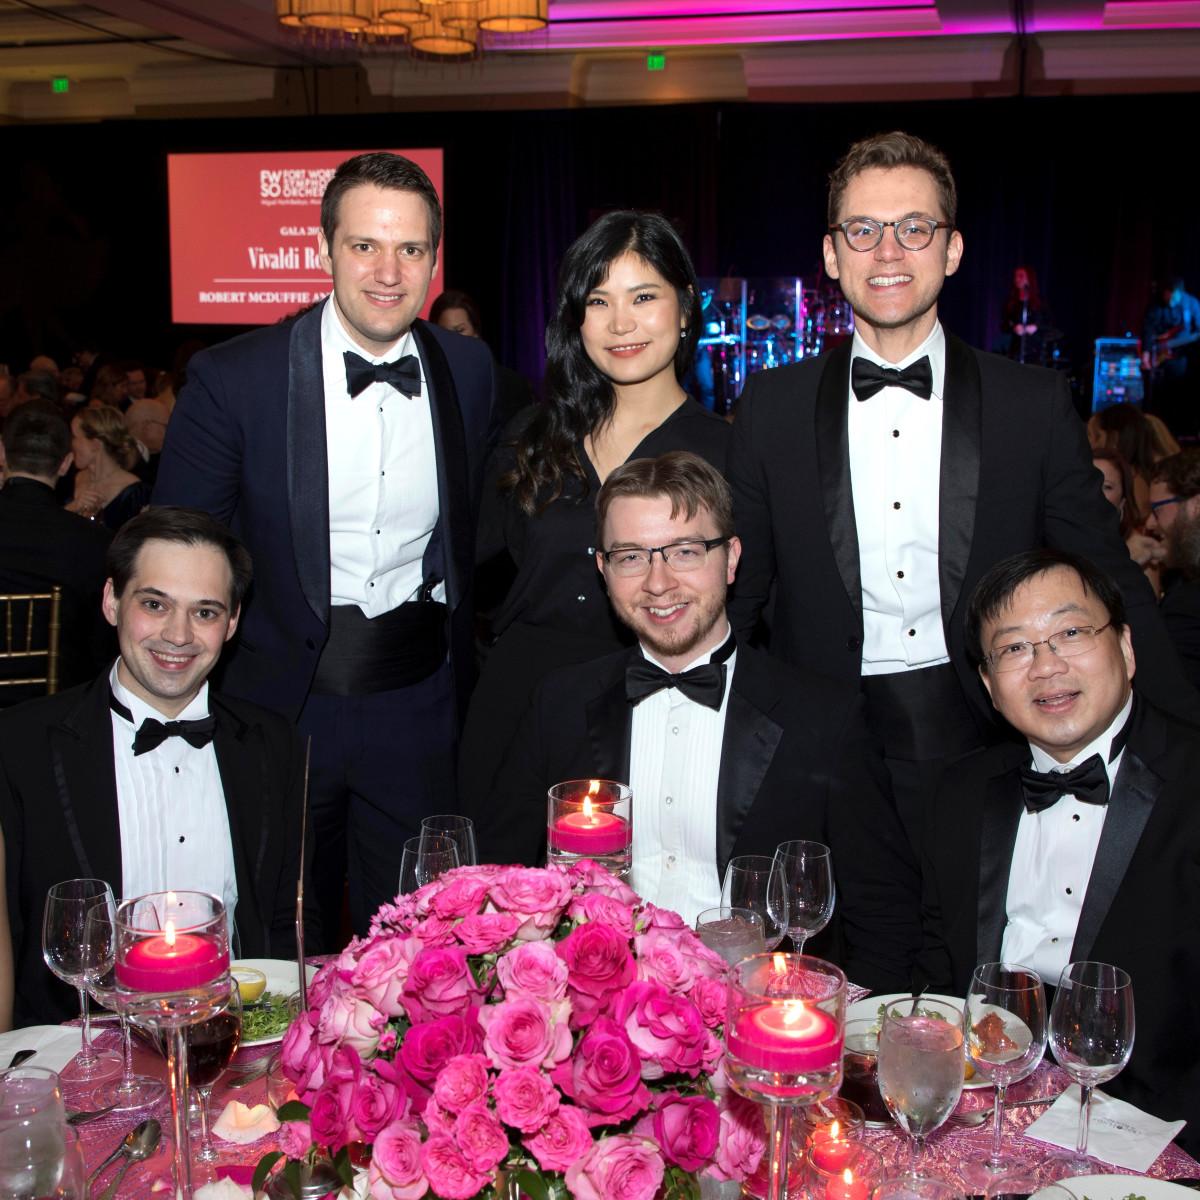 Jake Fridkis, HeeSun Yang, Gabe Fridkis. Front Row: Ann Hung, Stas Cherynshev, Allan Steele, Michael Shih, & Tzu-Ying Jamie Chan